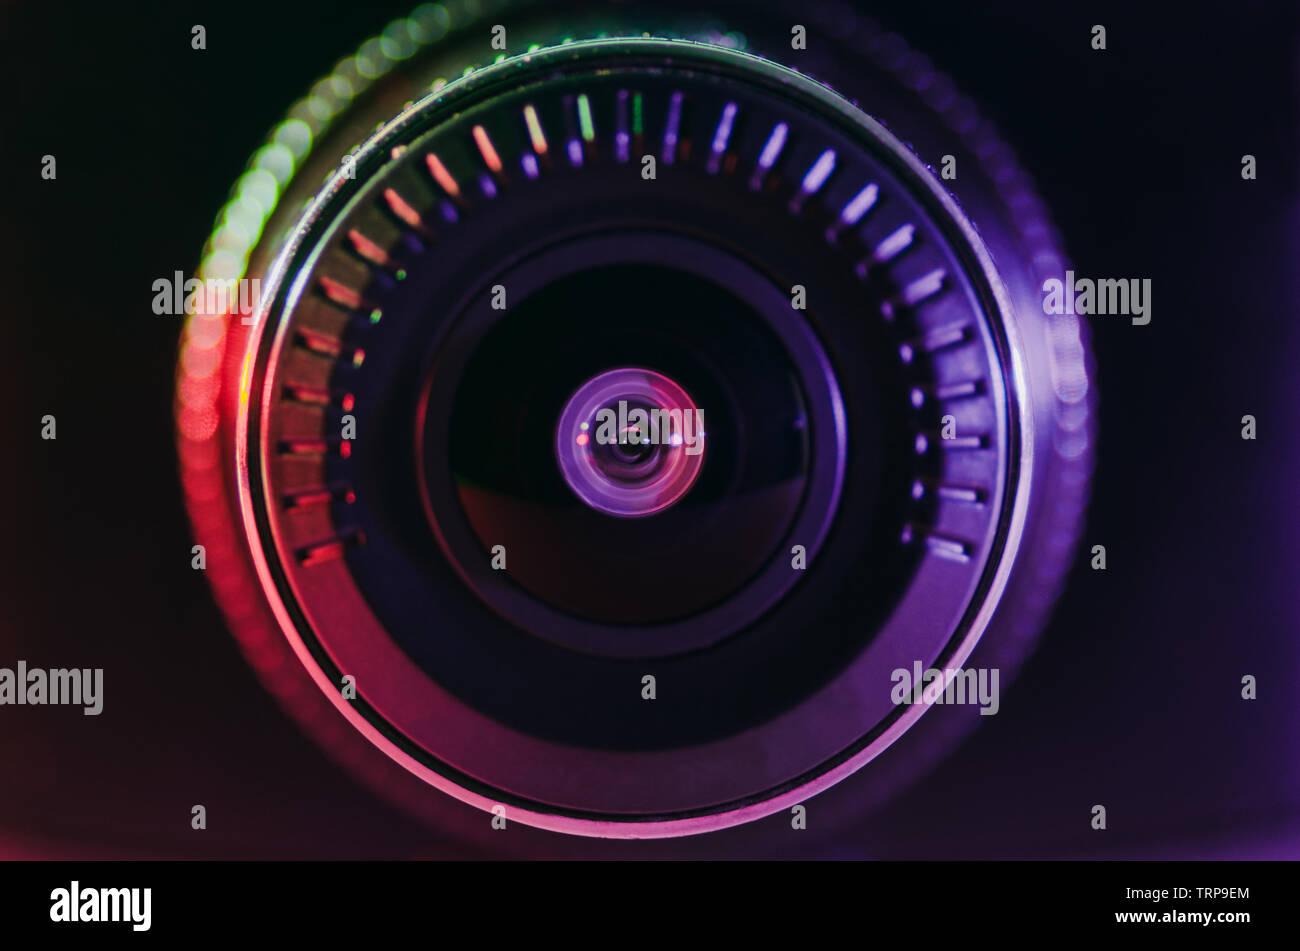 The camera lens with colored light, close photos, close-up - Stock Image